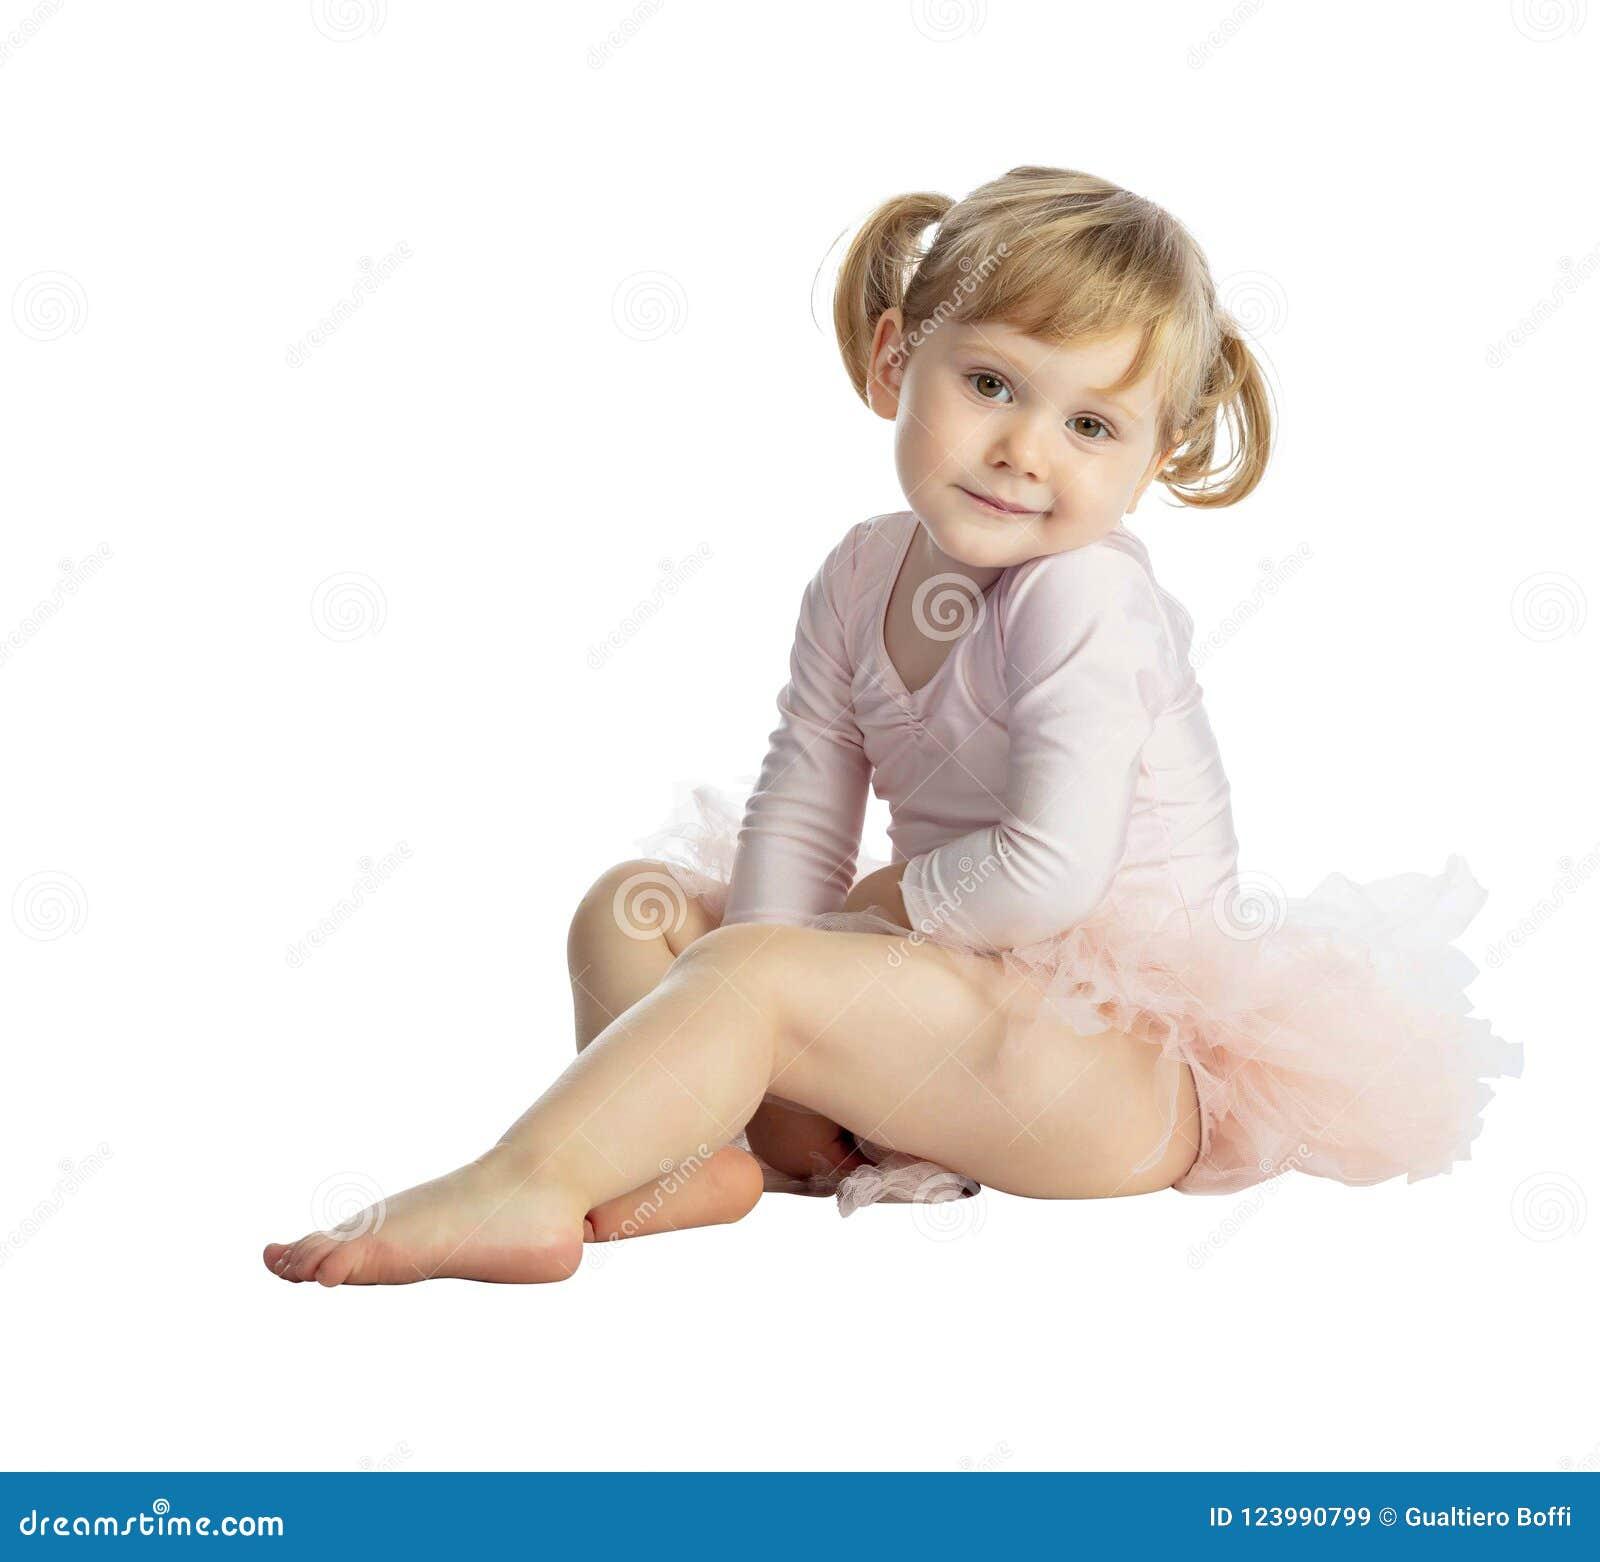 ff9ae8fe320b72 Isolated Female Child With Tutu Stock Image - Image of grace ...